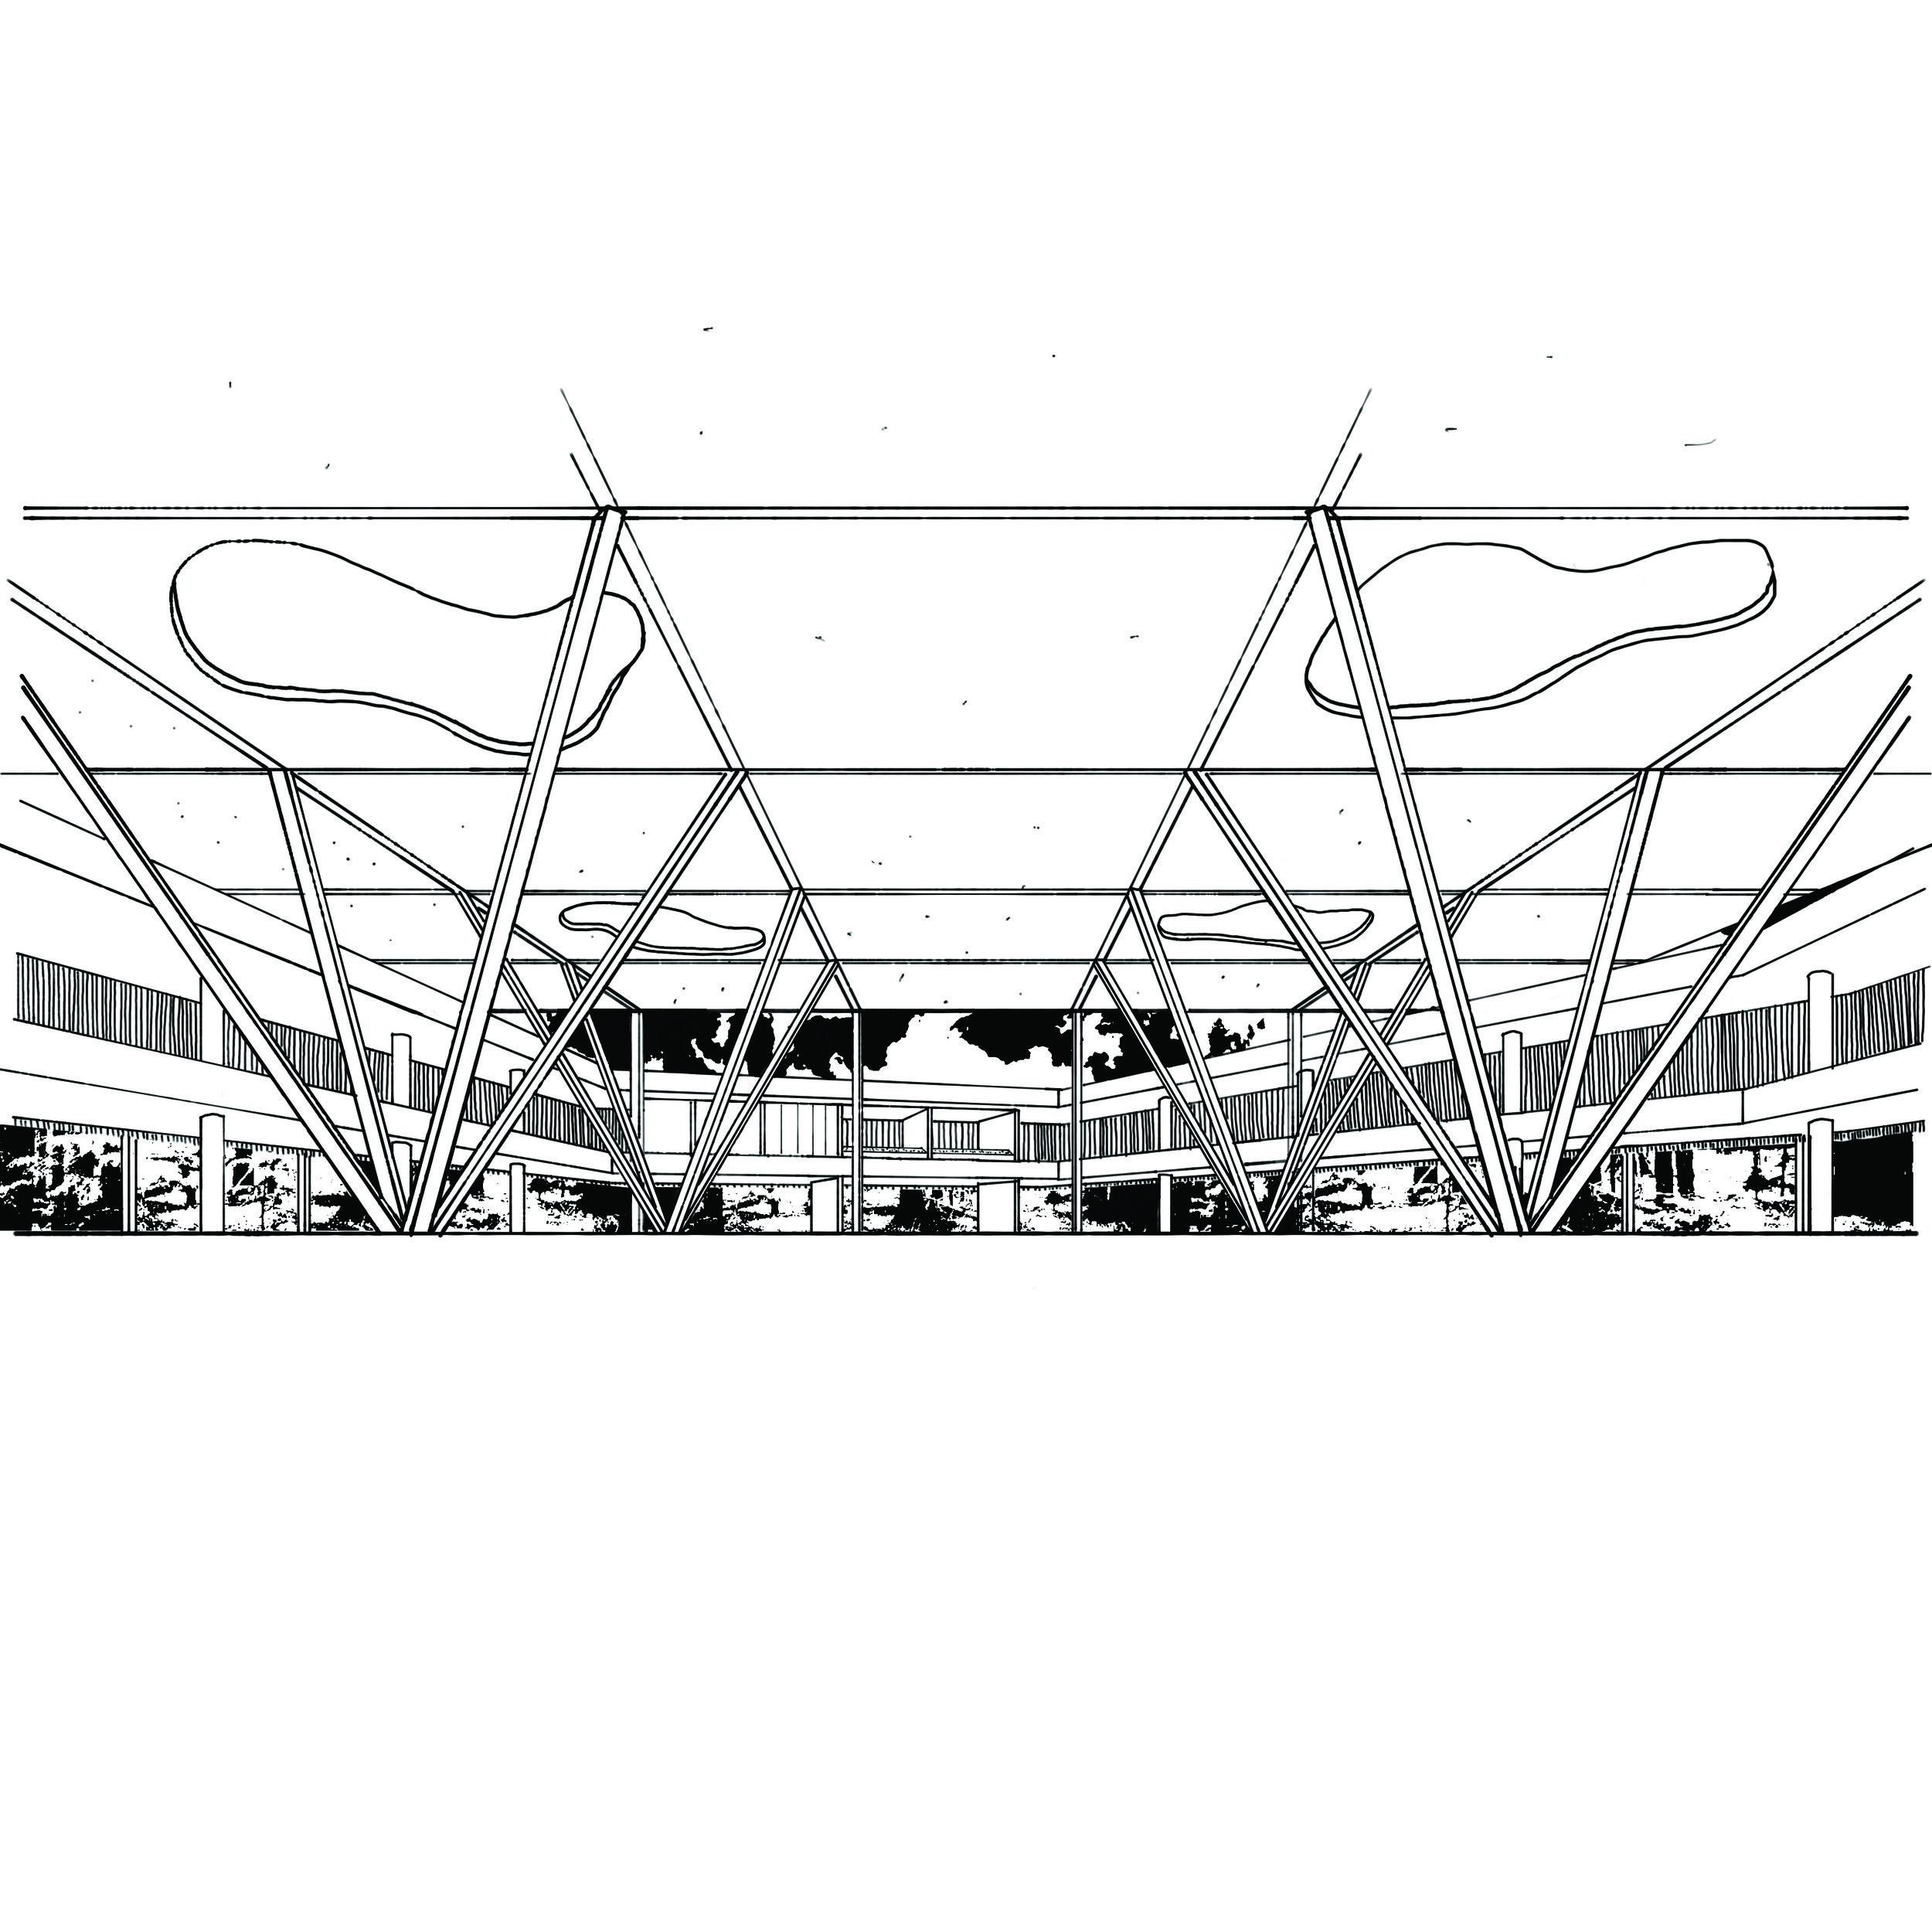 10_Swerdlin_Perspective_Interior.jpg